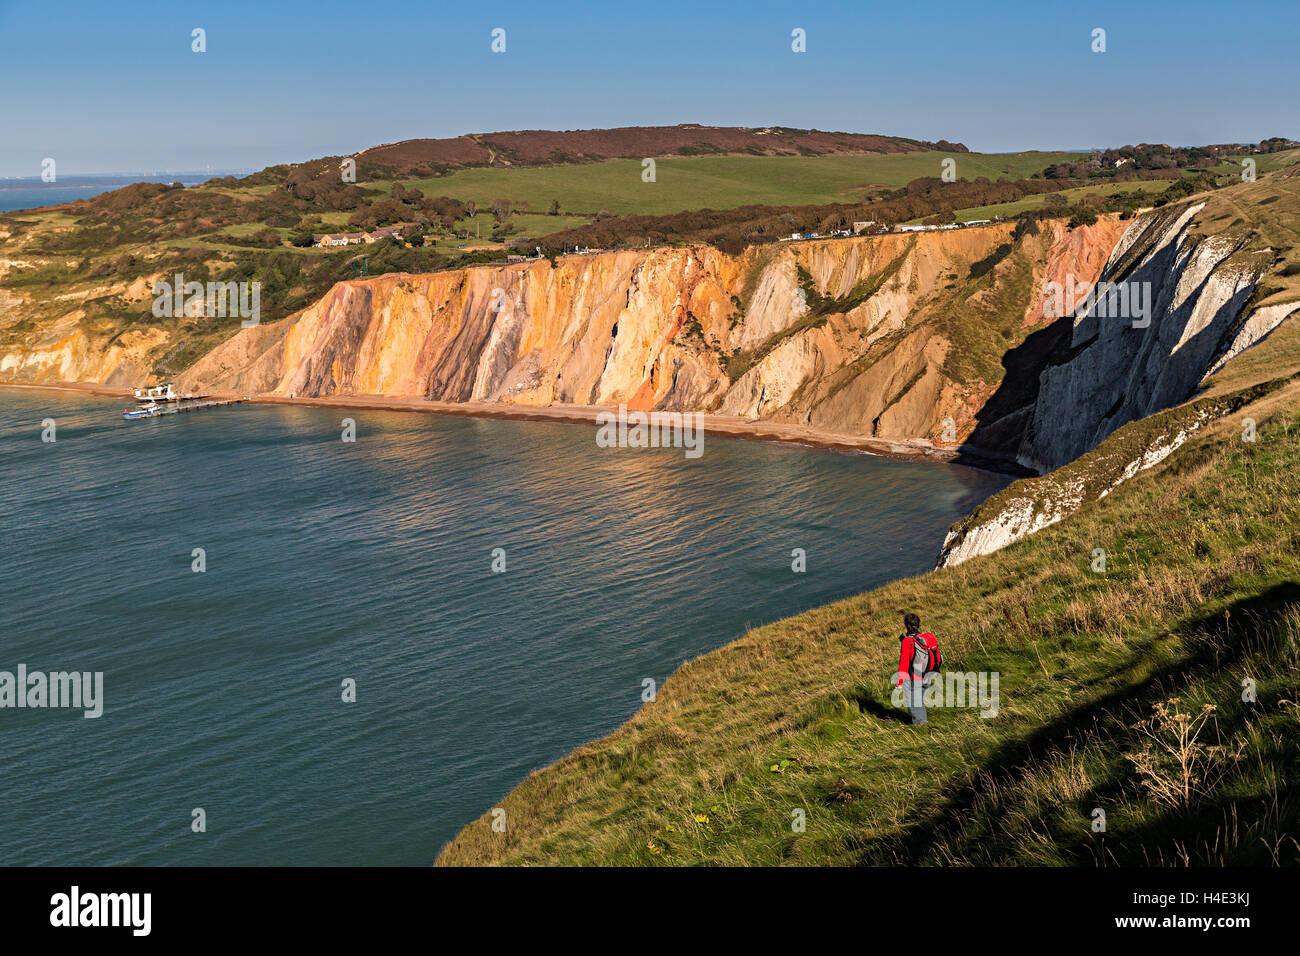 Wanderer an der Klippe Rand Alum Bay, Isle Of Wight, Großbritannien Stockfoto